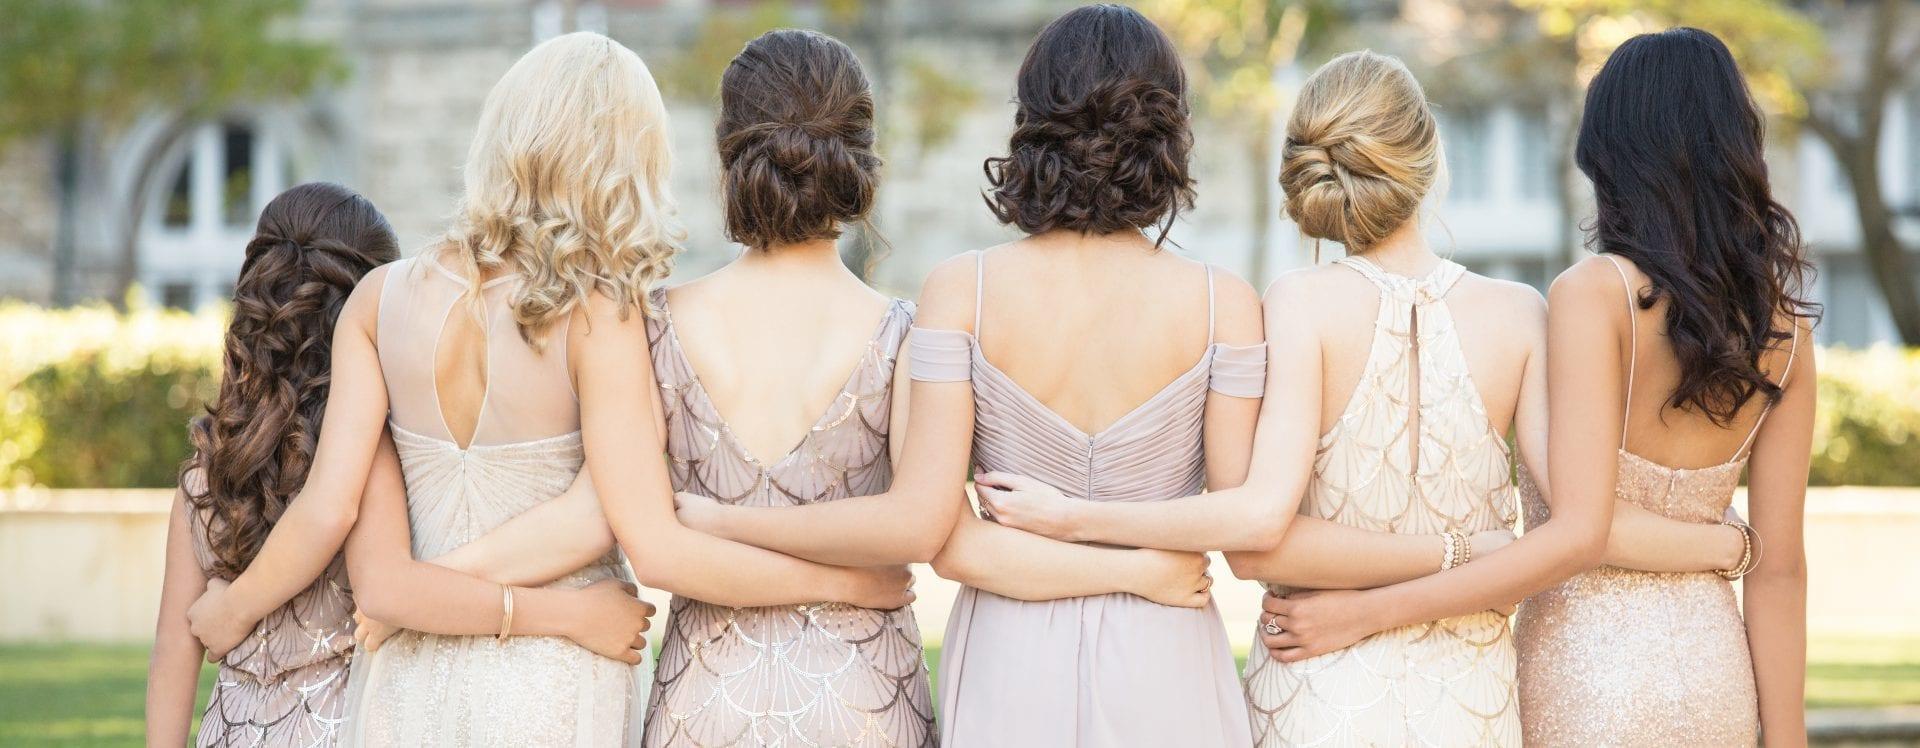 bridesmaidspic